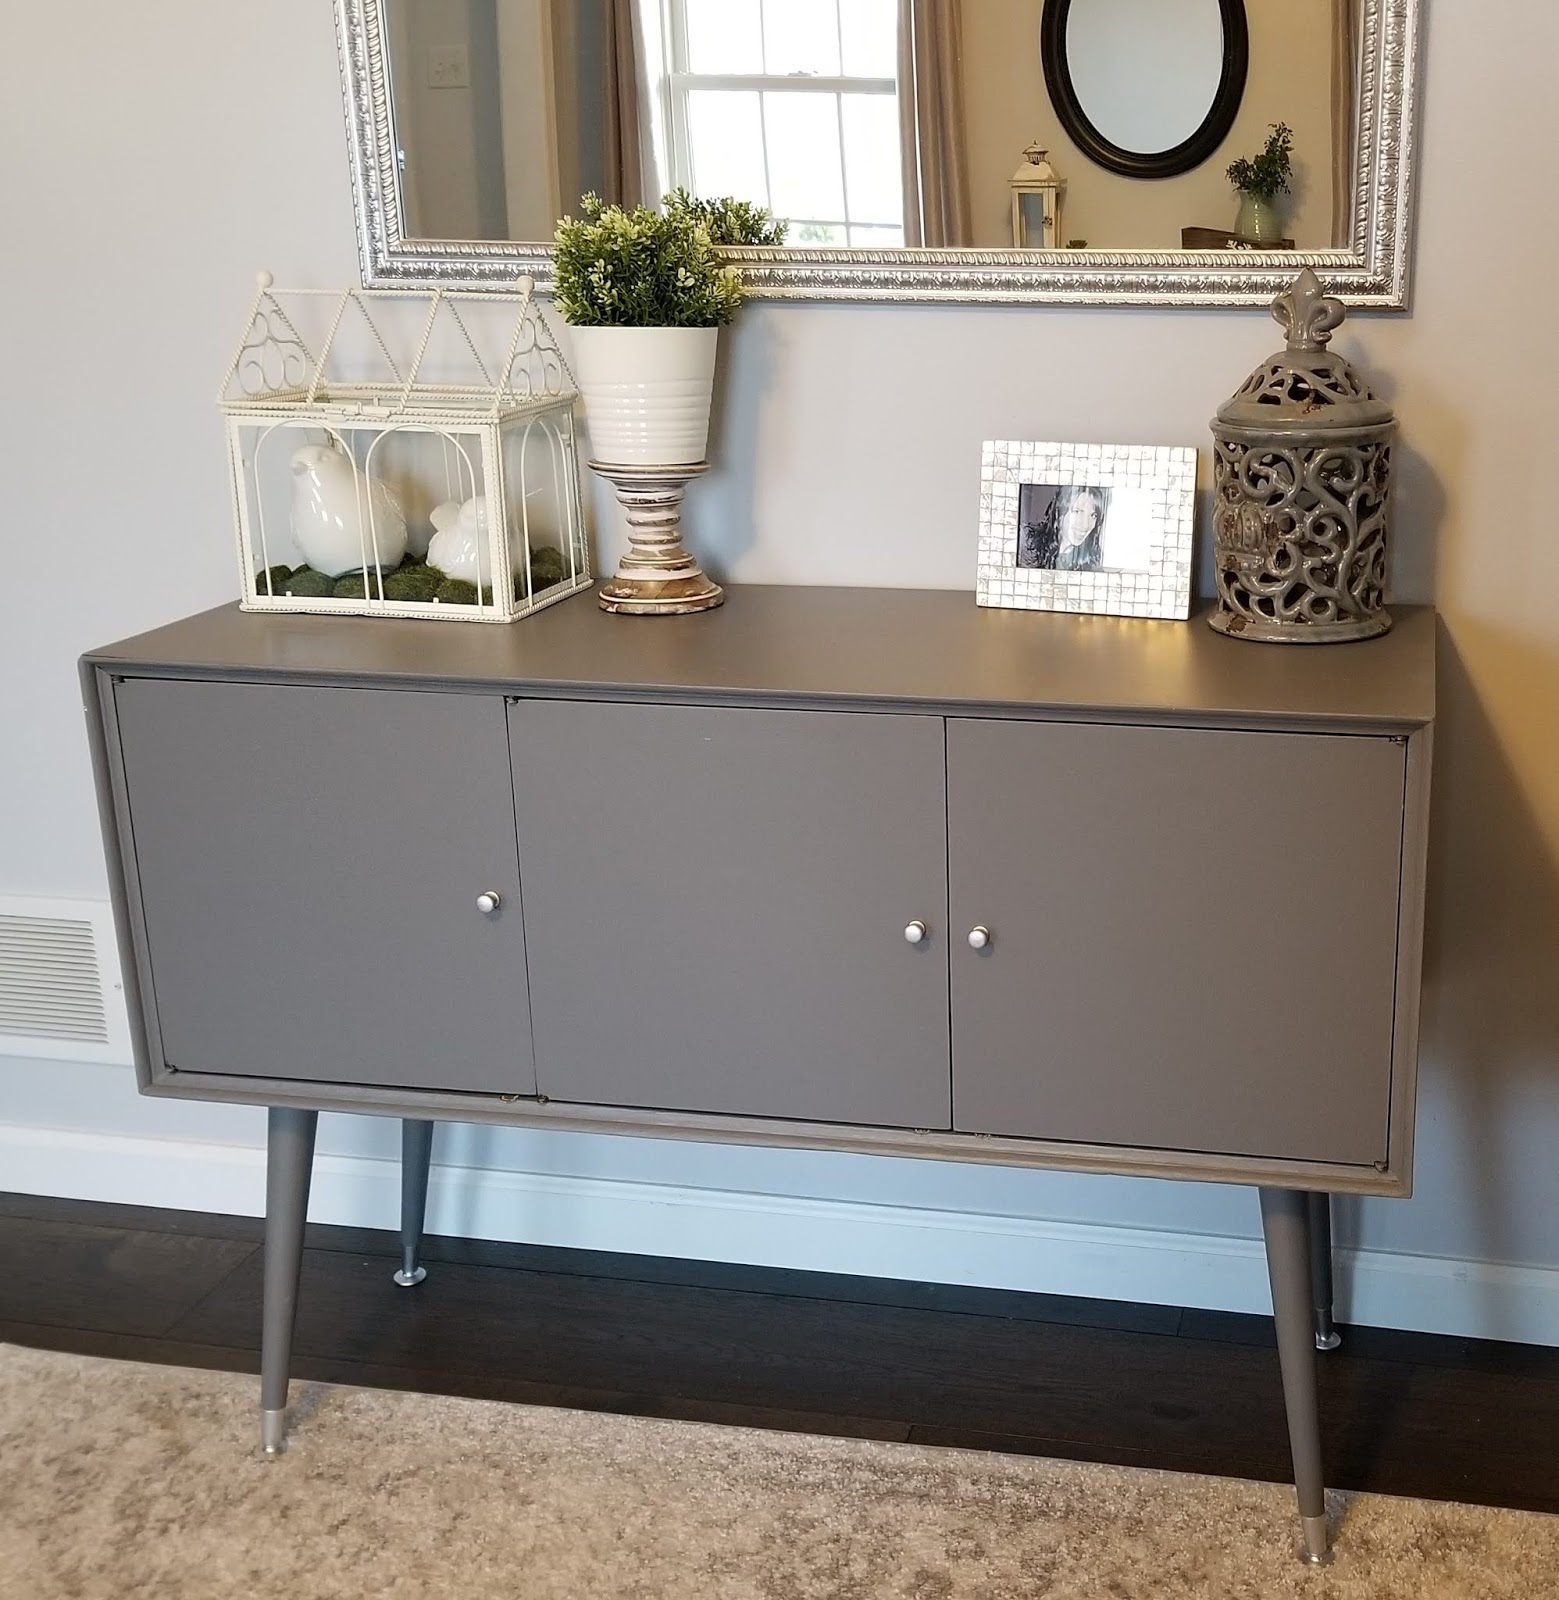 Midcentury Mid Century Modern Cabinet DIY